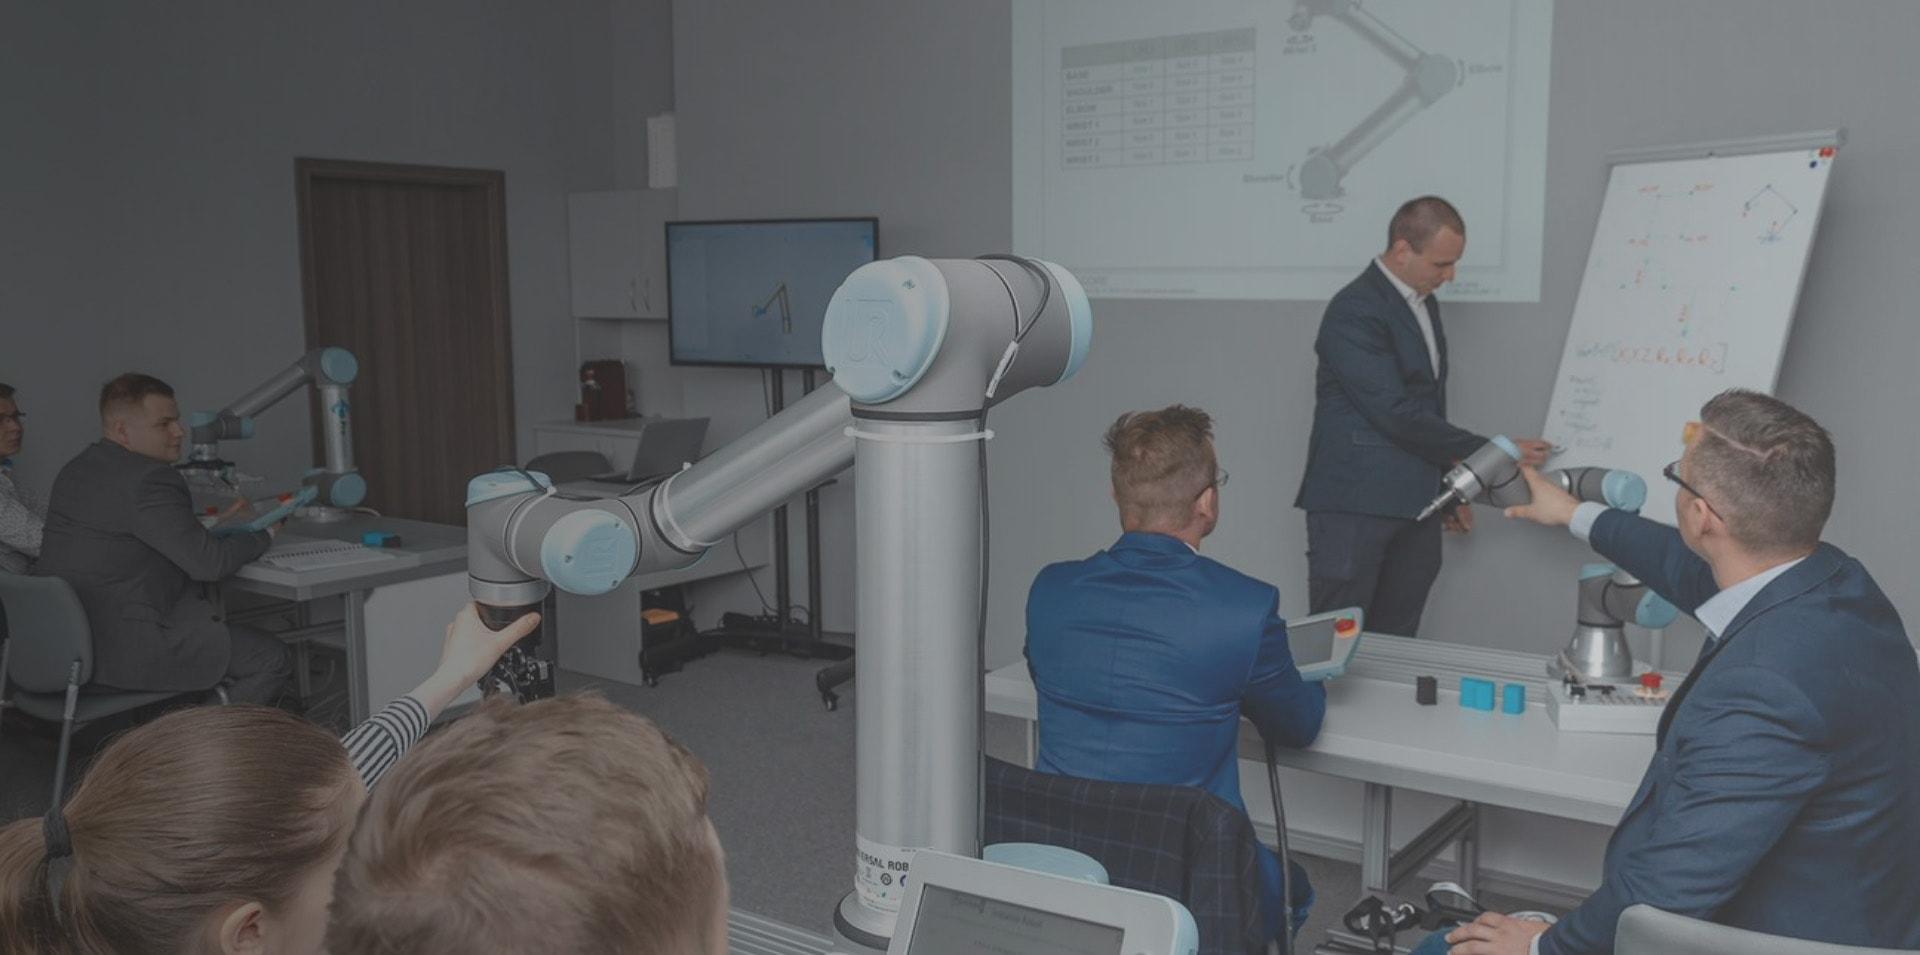 Blog o robotyce, automatyce, roboty ur, roboty mir